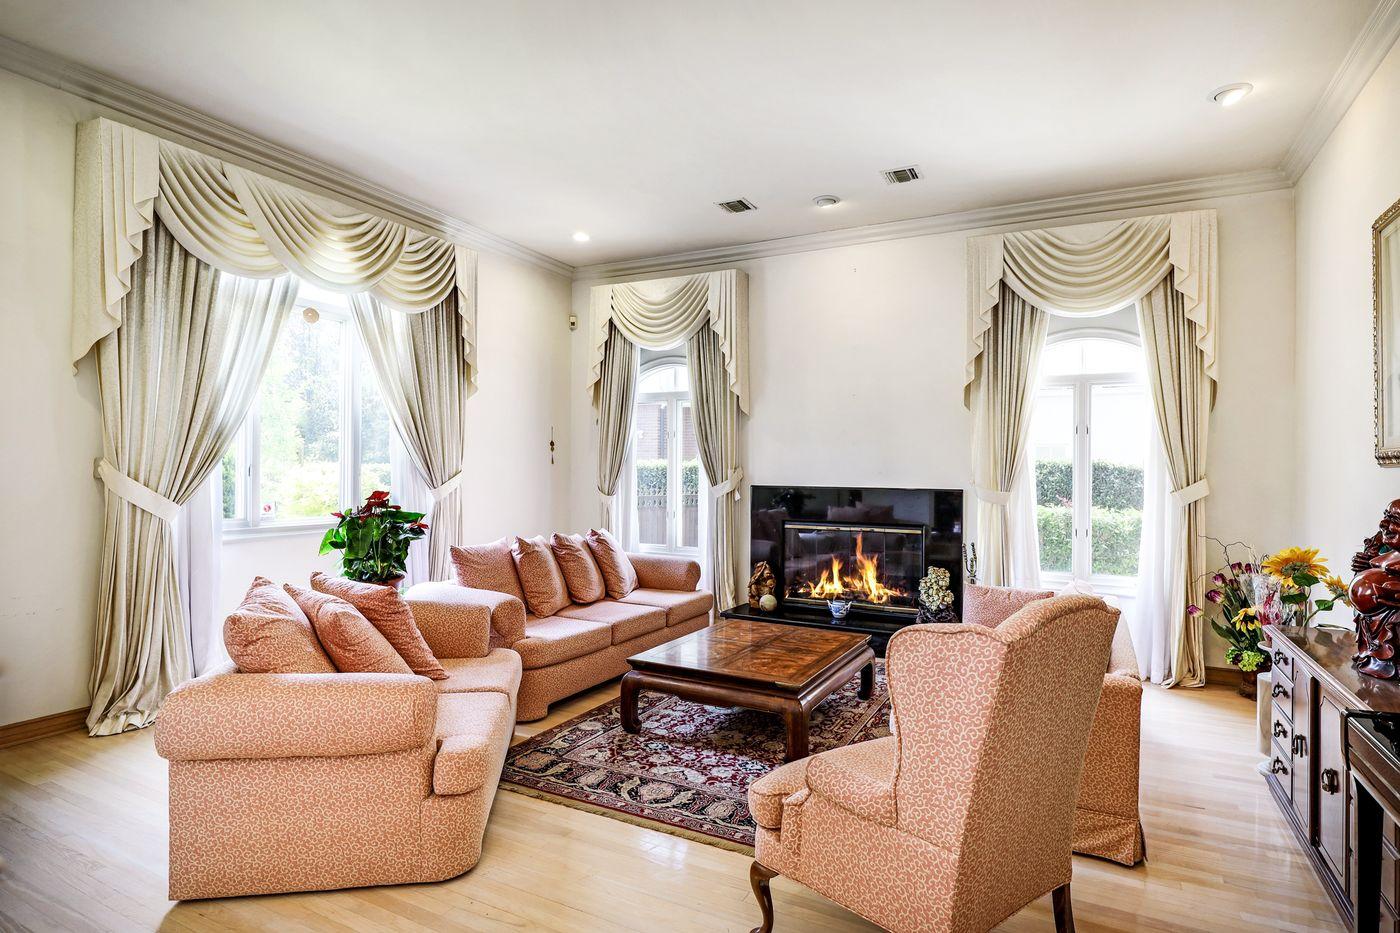 real-estate-photography-2245 Kingsbridge Ct-San Dimas-91773-airbnb-rental-interior-design-photographer-kasi-hyrapett-23